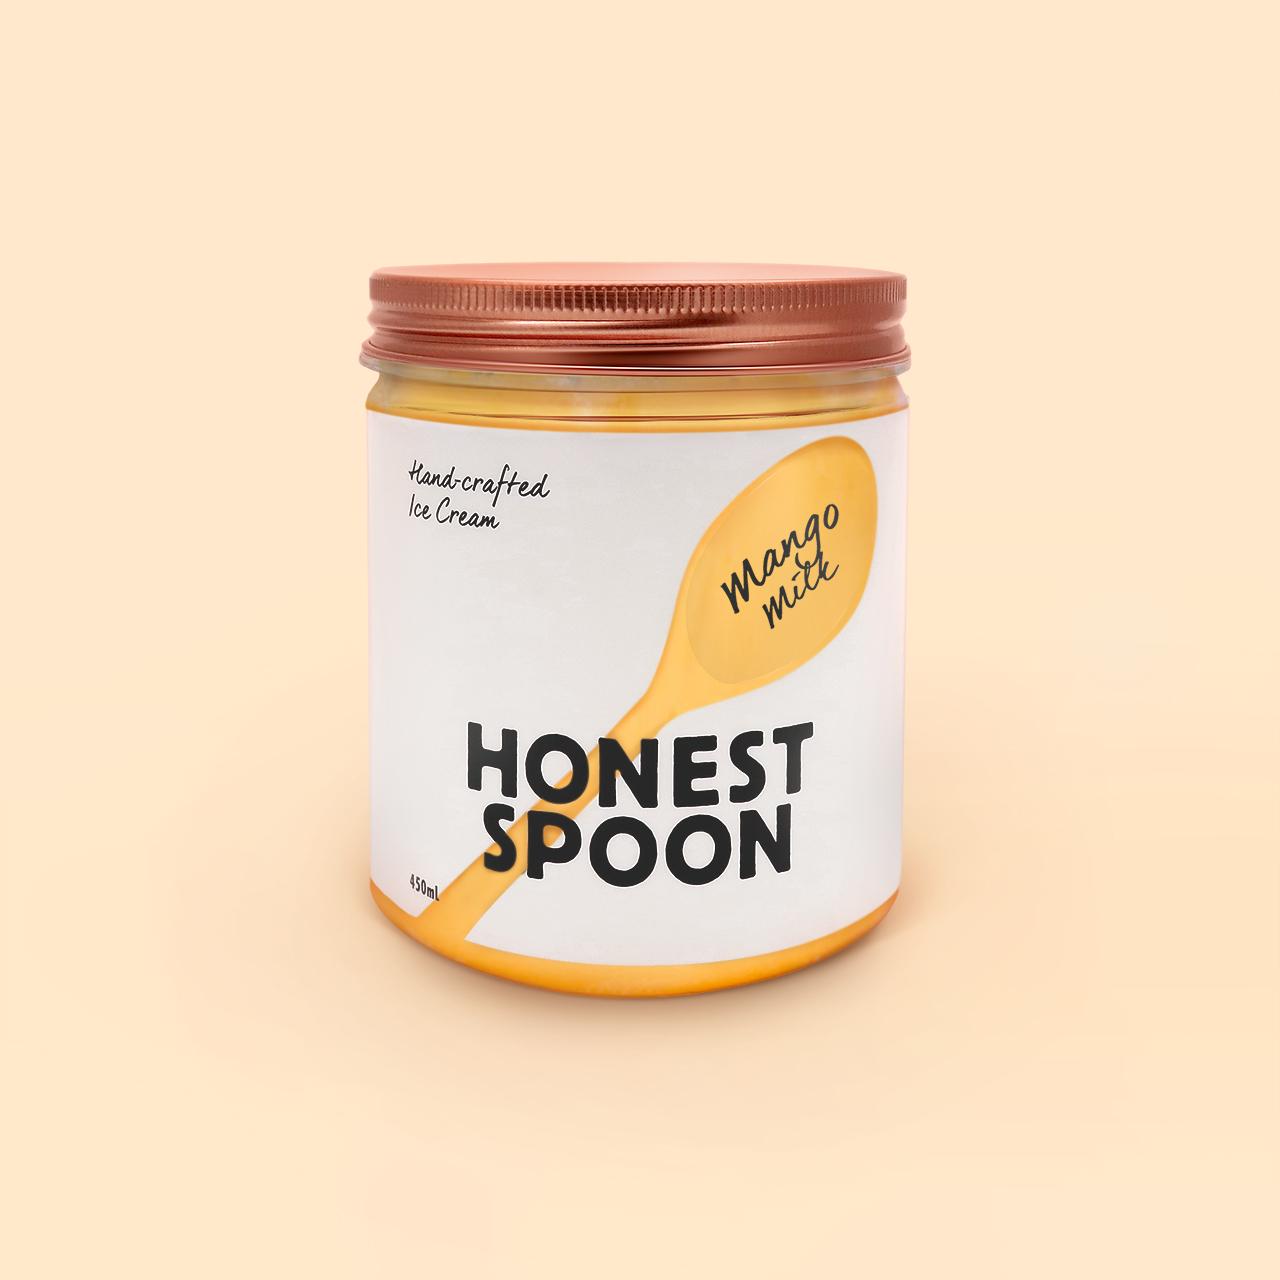 Brand and Packaging Design for Artisanal Ice Cream